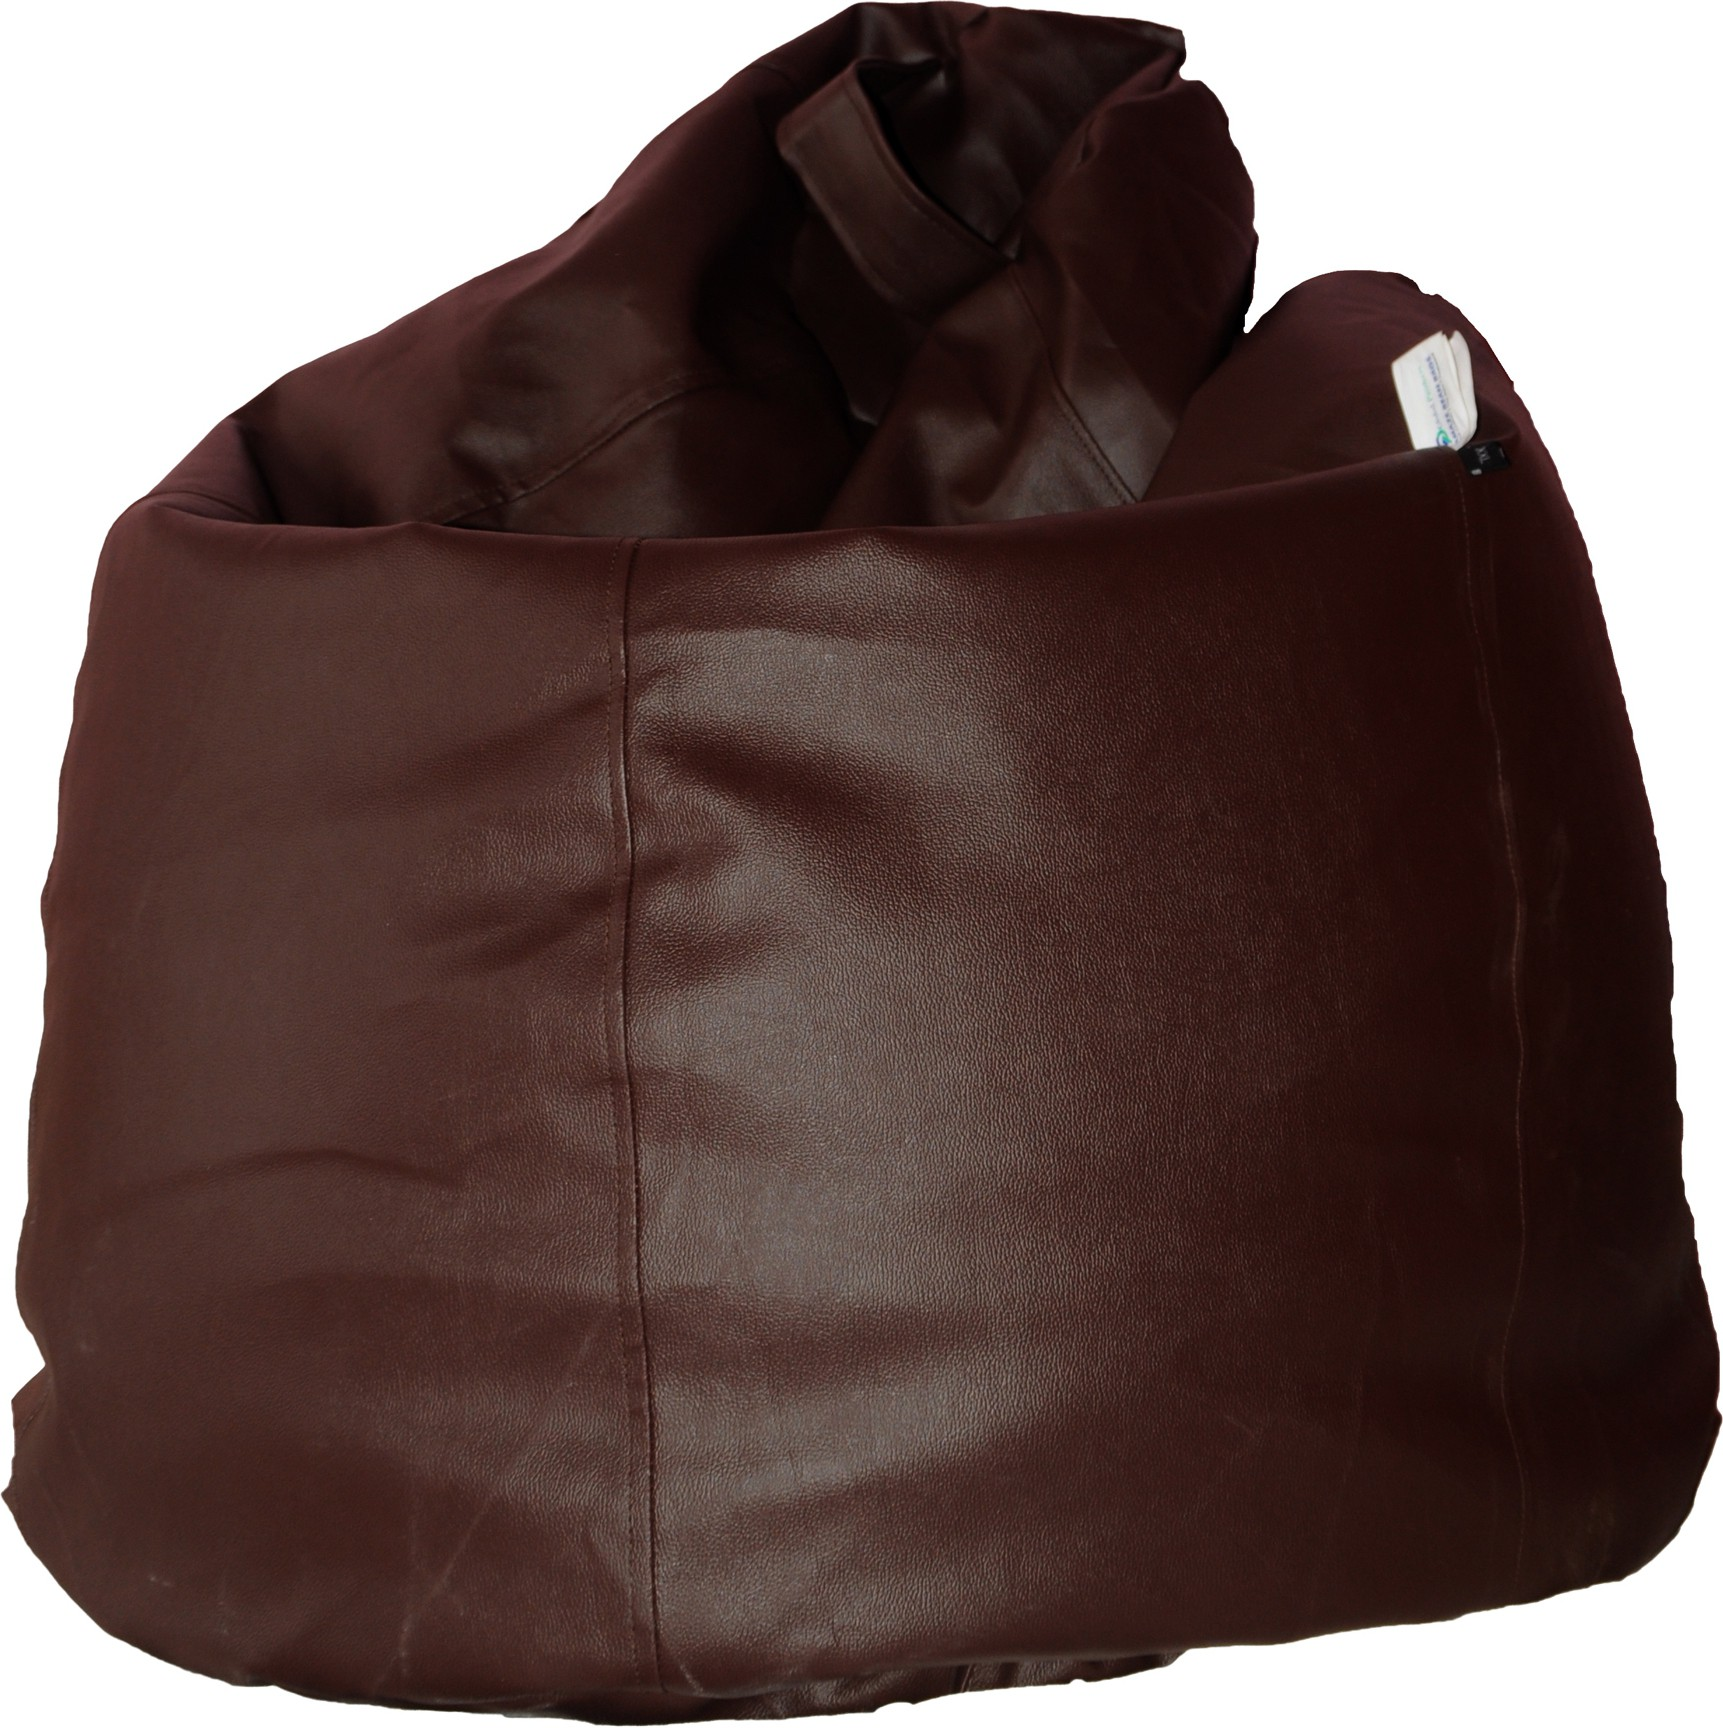 View Amaze XXL Bean Bag Cover(Brown) Furniture (Amaze)